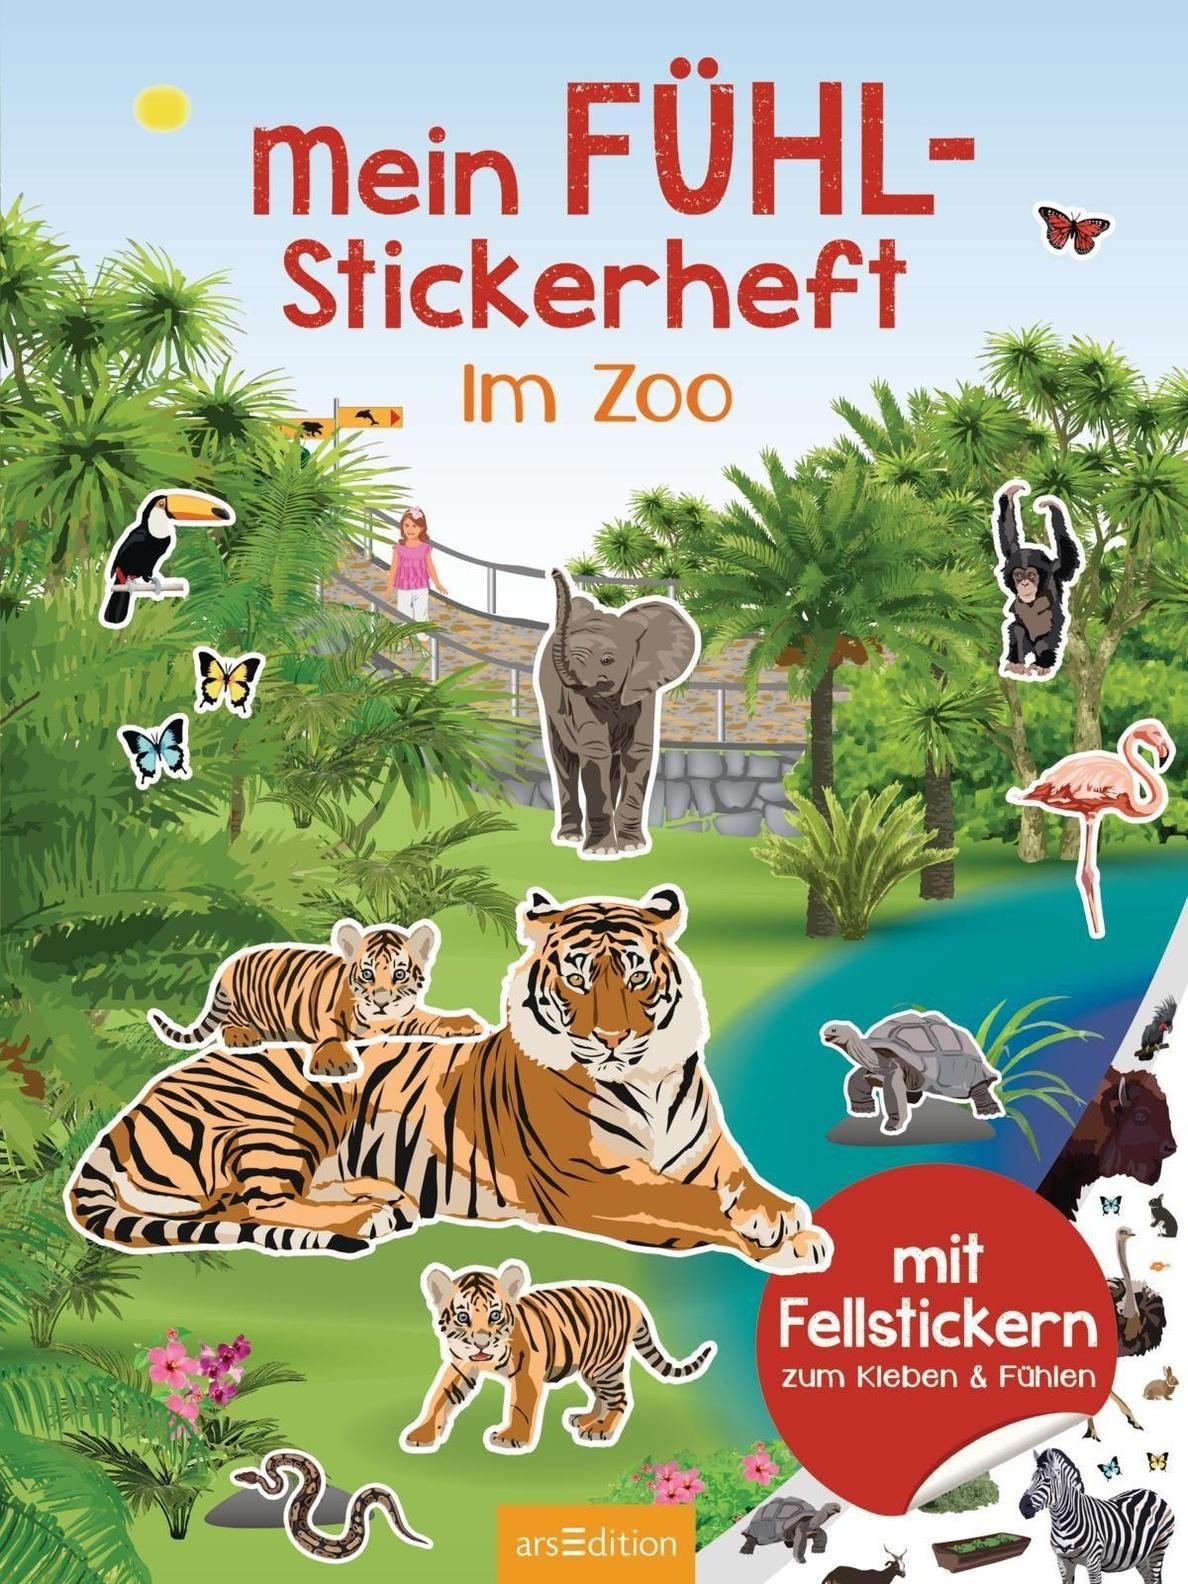 Zoo im im Zoo